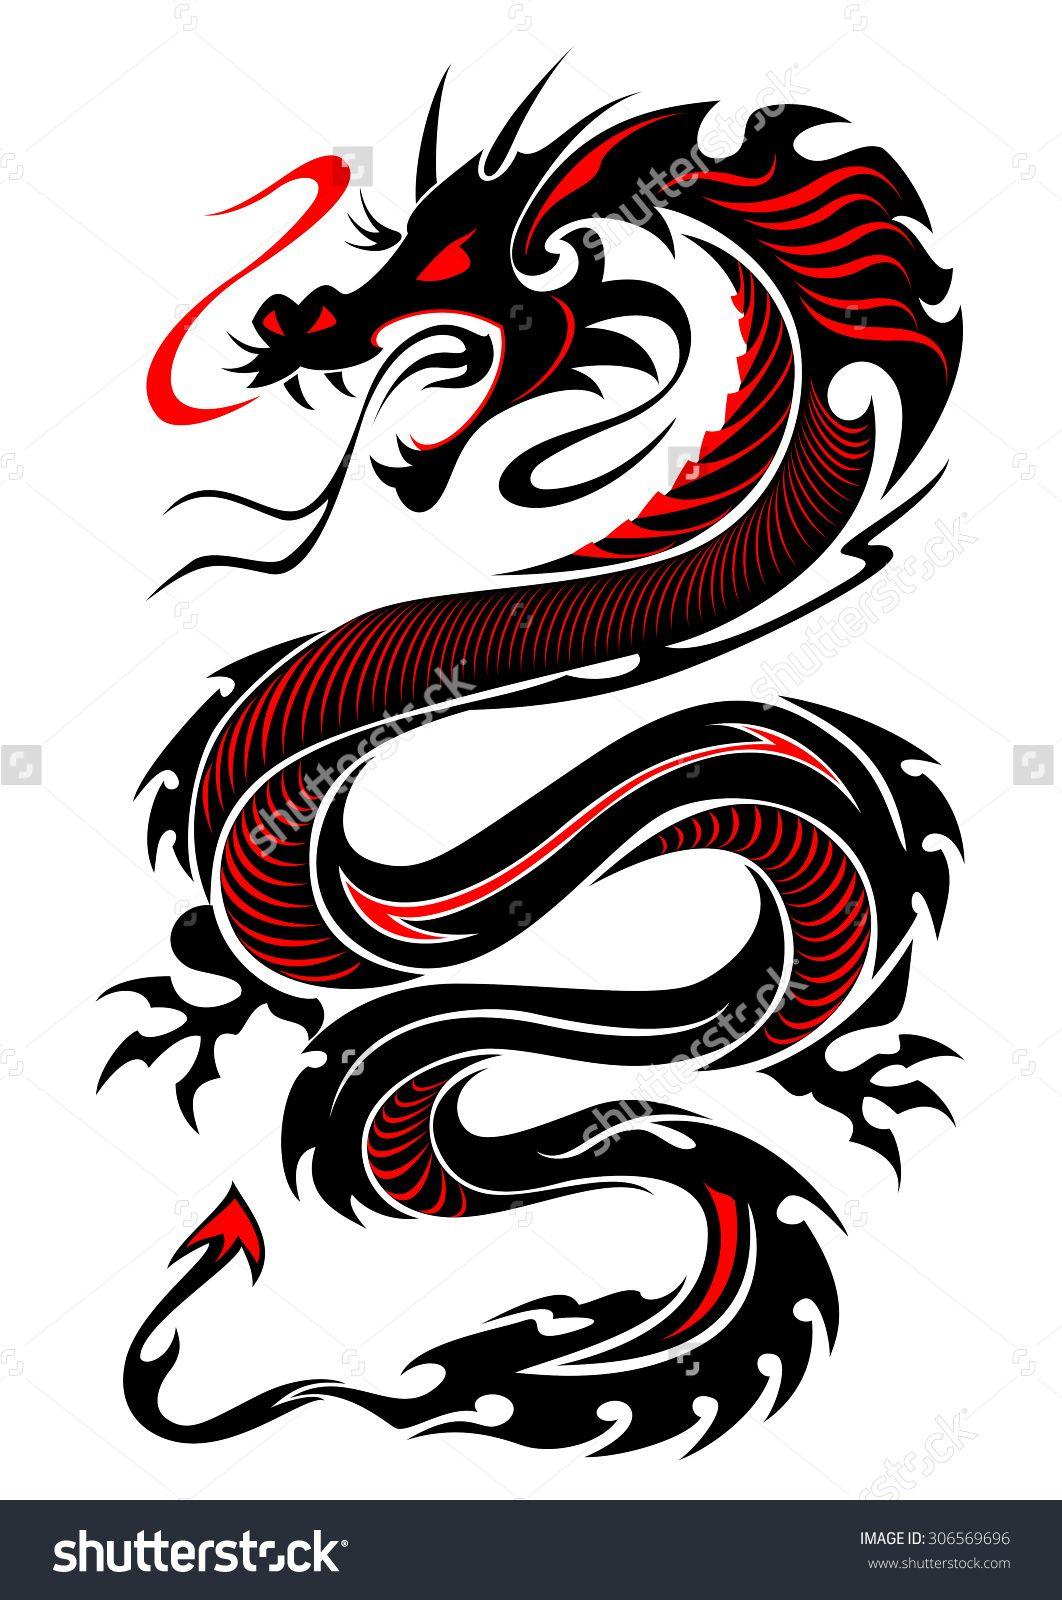 Flaming Tribal Dragon Tattoo Vector Illustration In Black